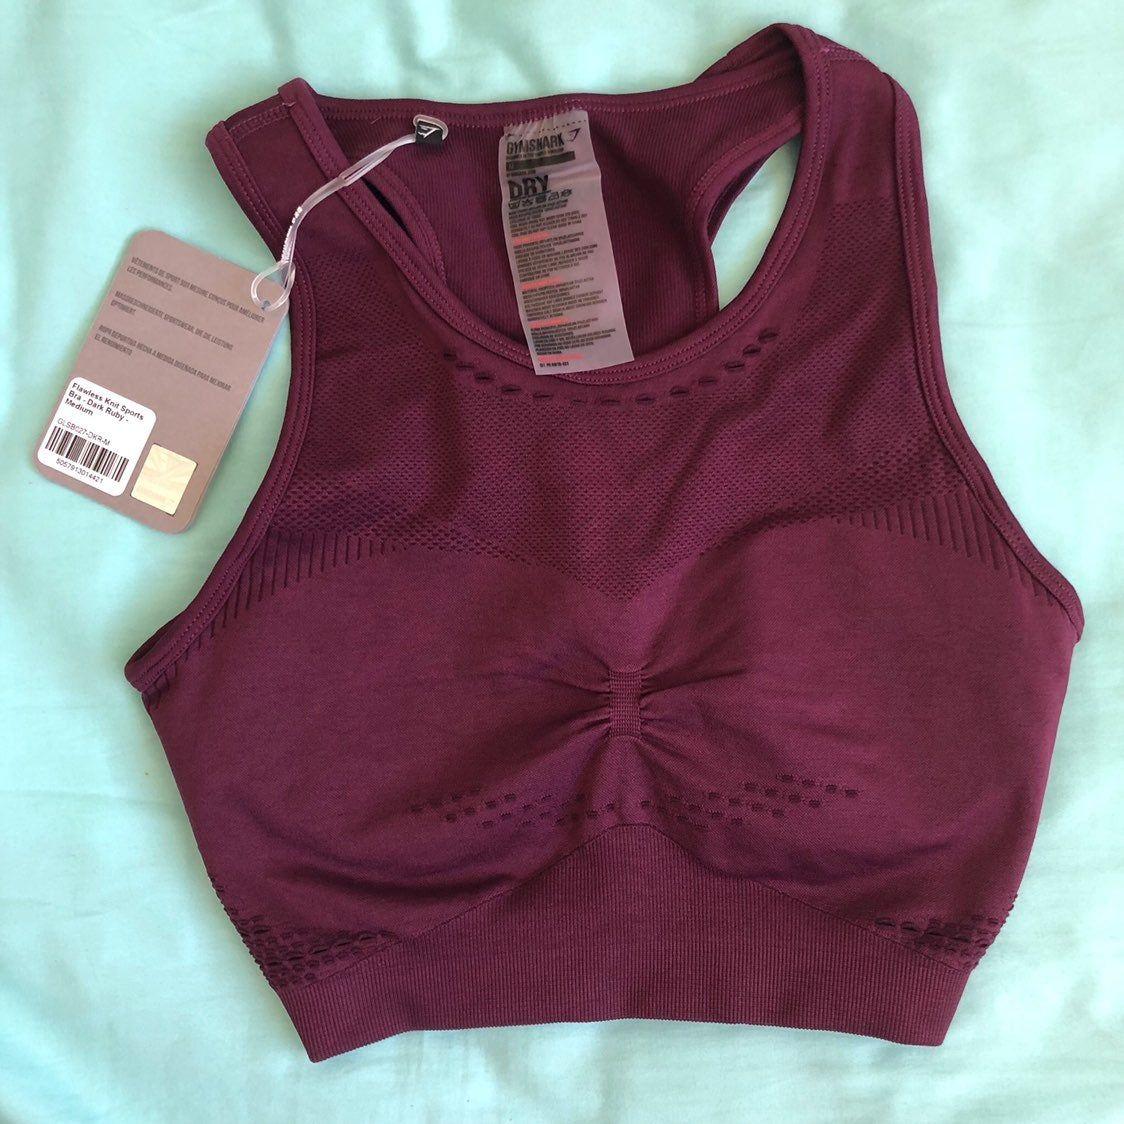 Brand new with tag. Size medium Sports bra, Bra, Gymshark